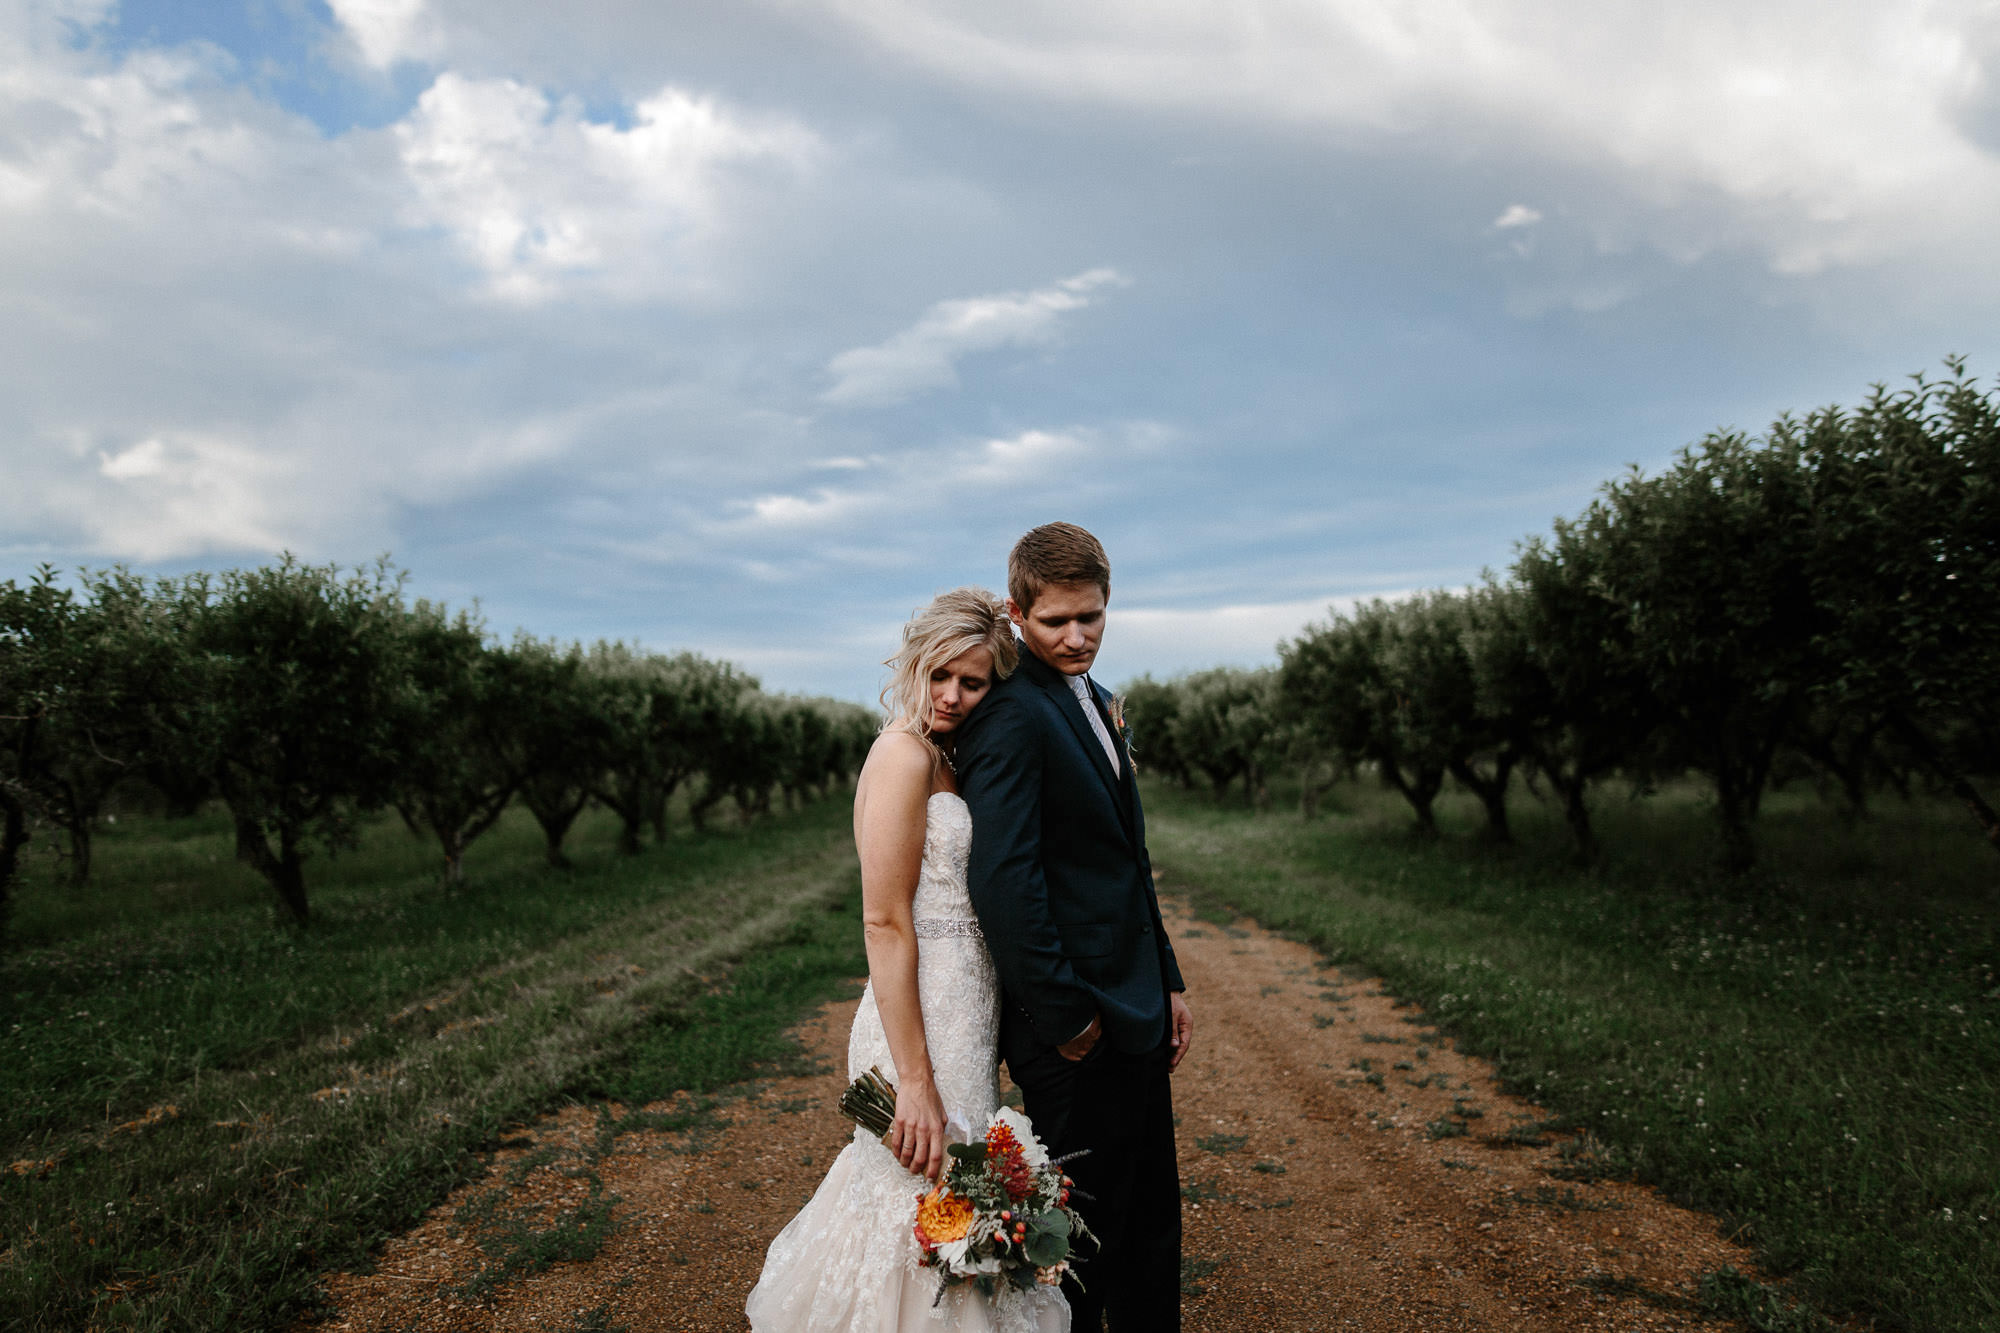 meadow-barn-wedding-sioux-falls-south-dakota-romantic-adventerous-michael-liedtke-photography092.jpg